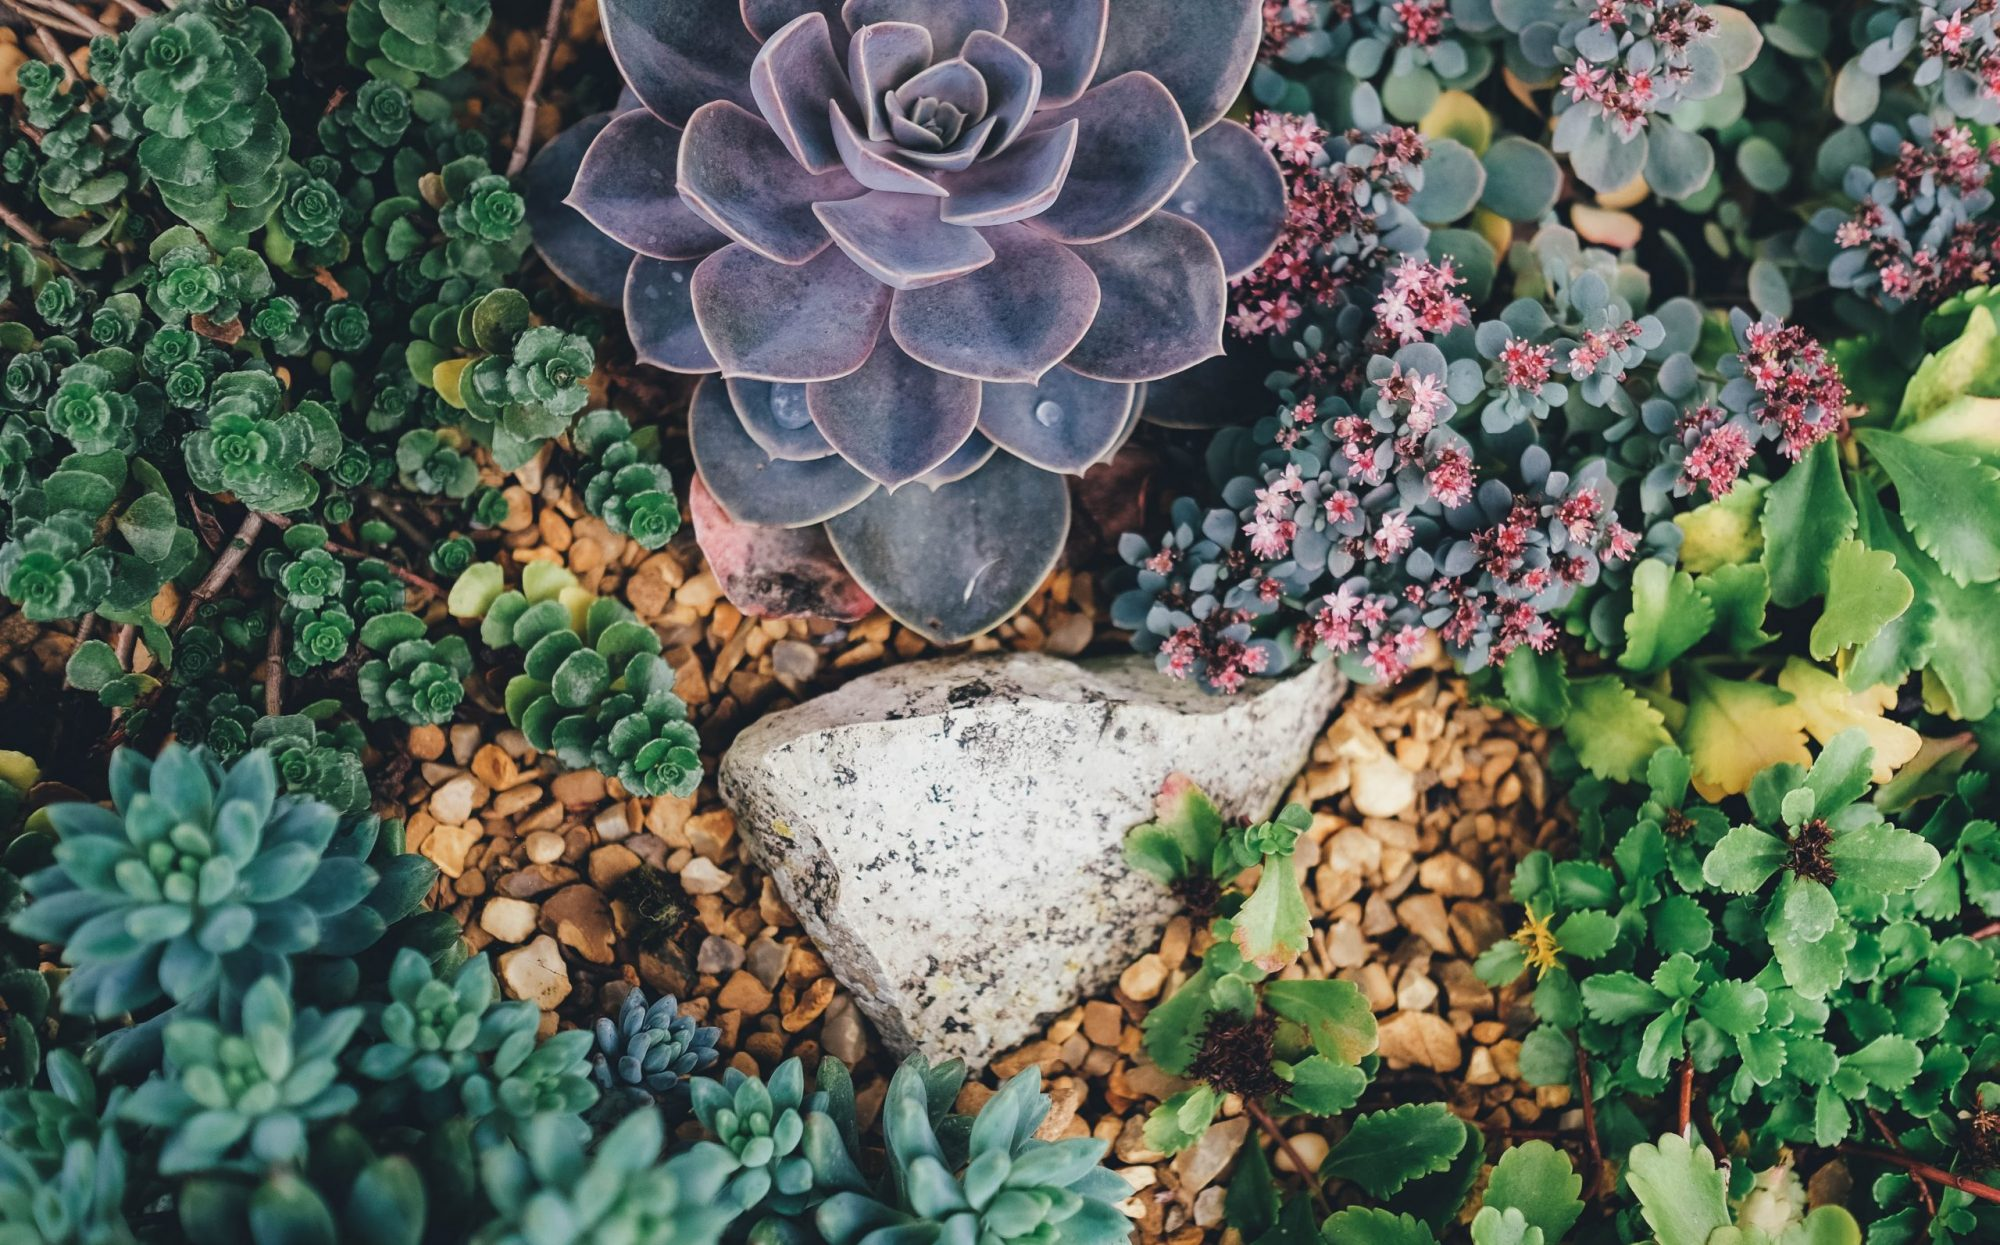 Healing Generational Trauma: the Gateway to Compassion